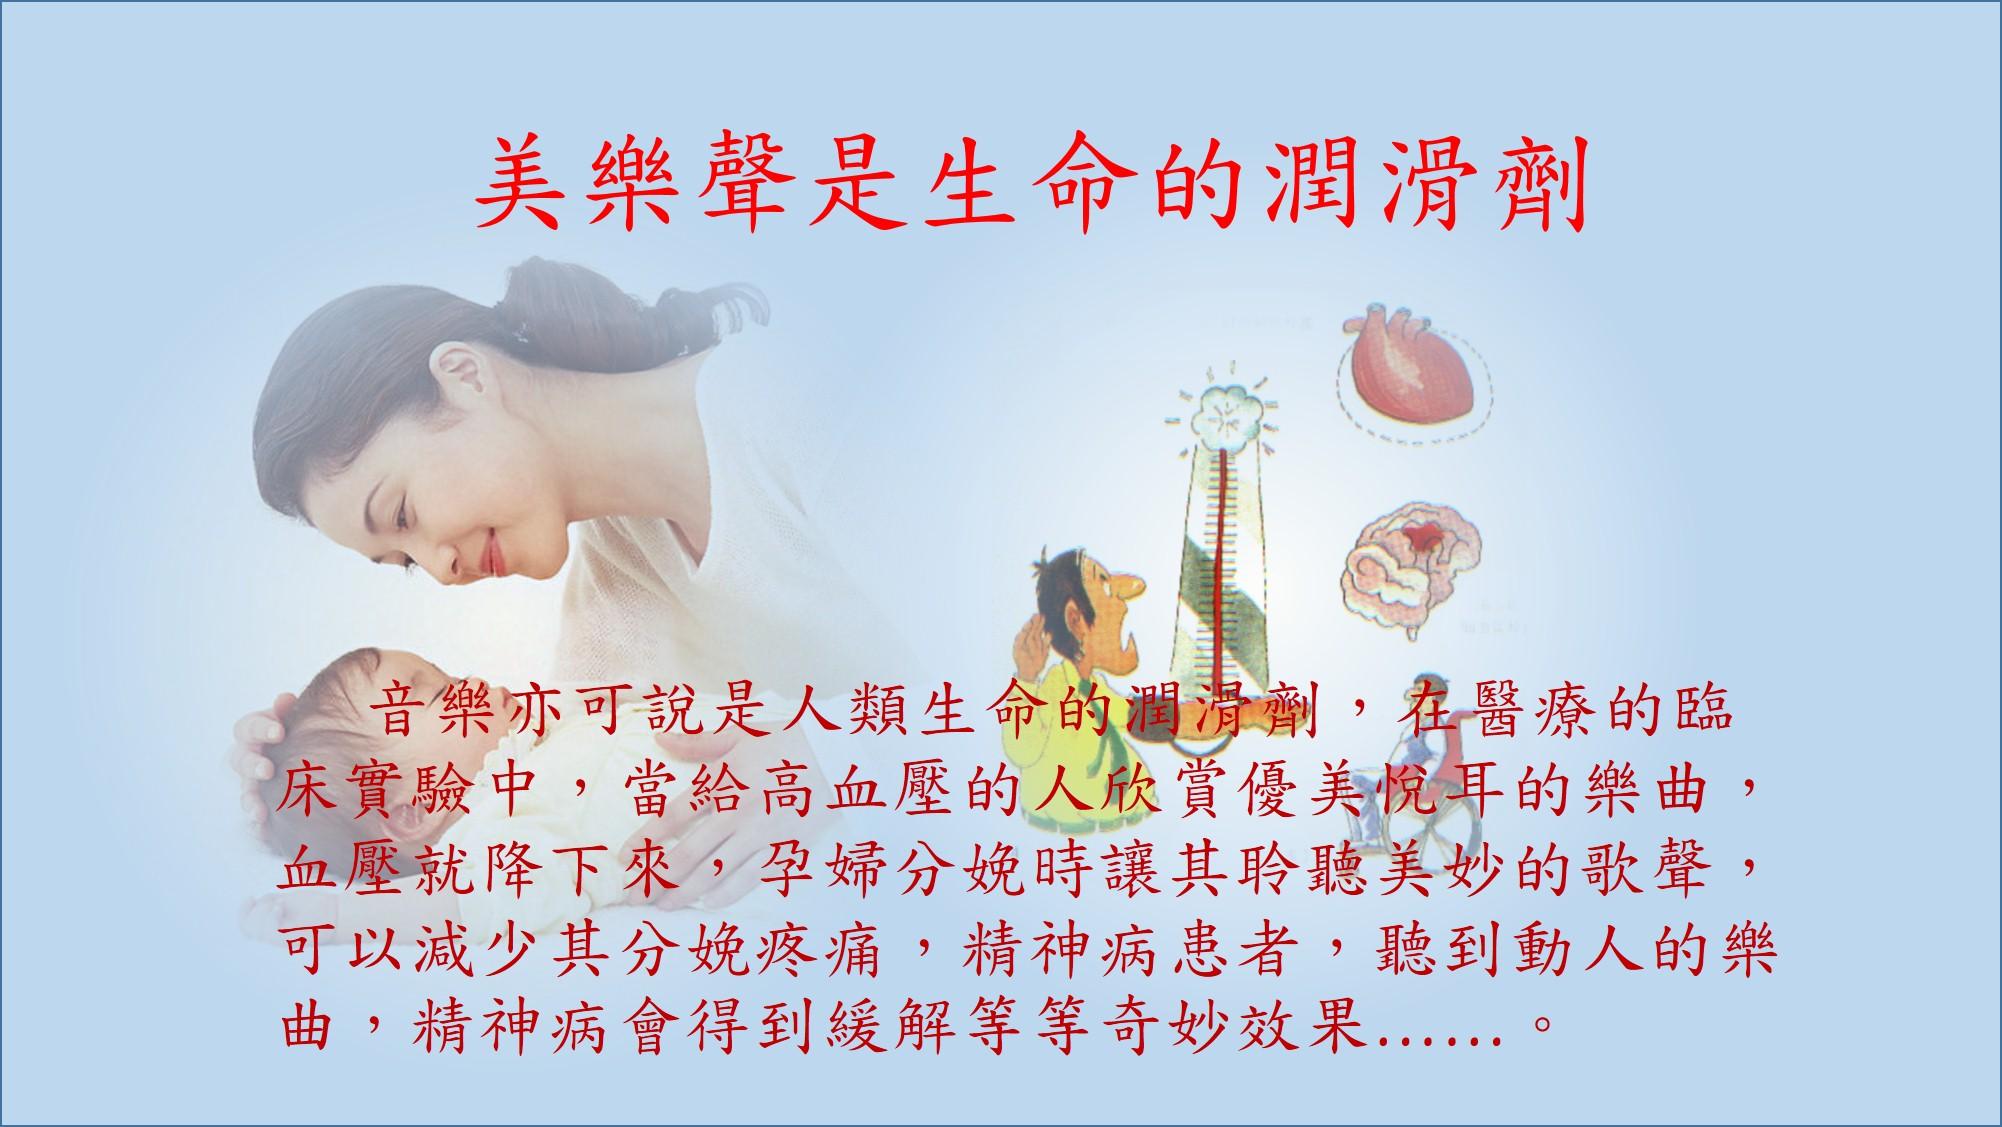 http://taiwancom.tw/biochip/biowell-17.jpg